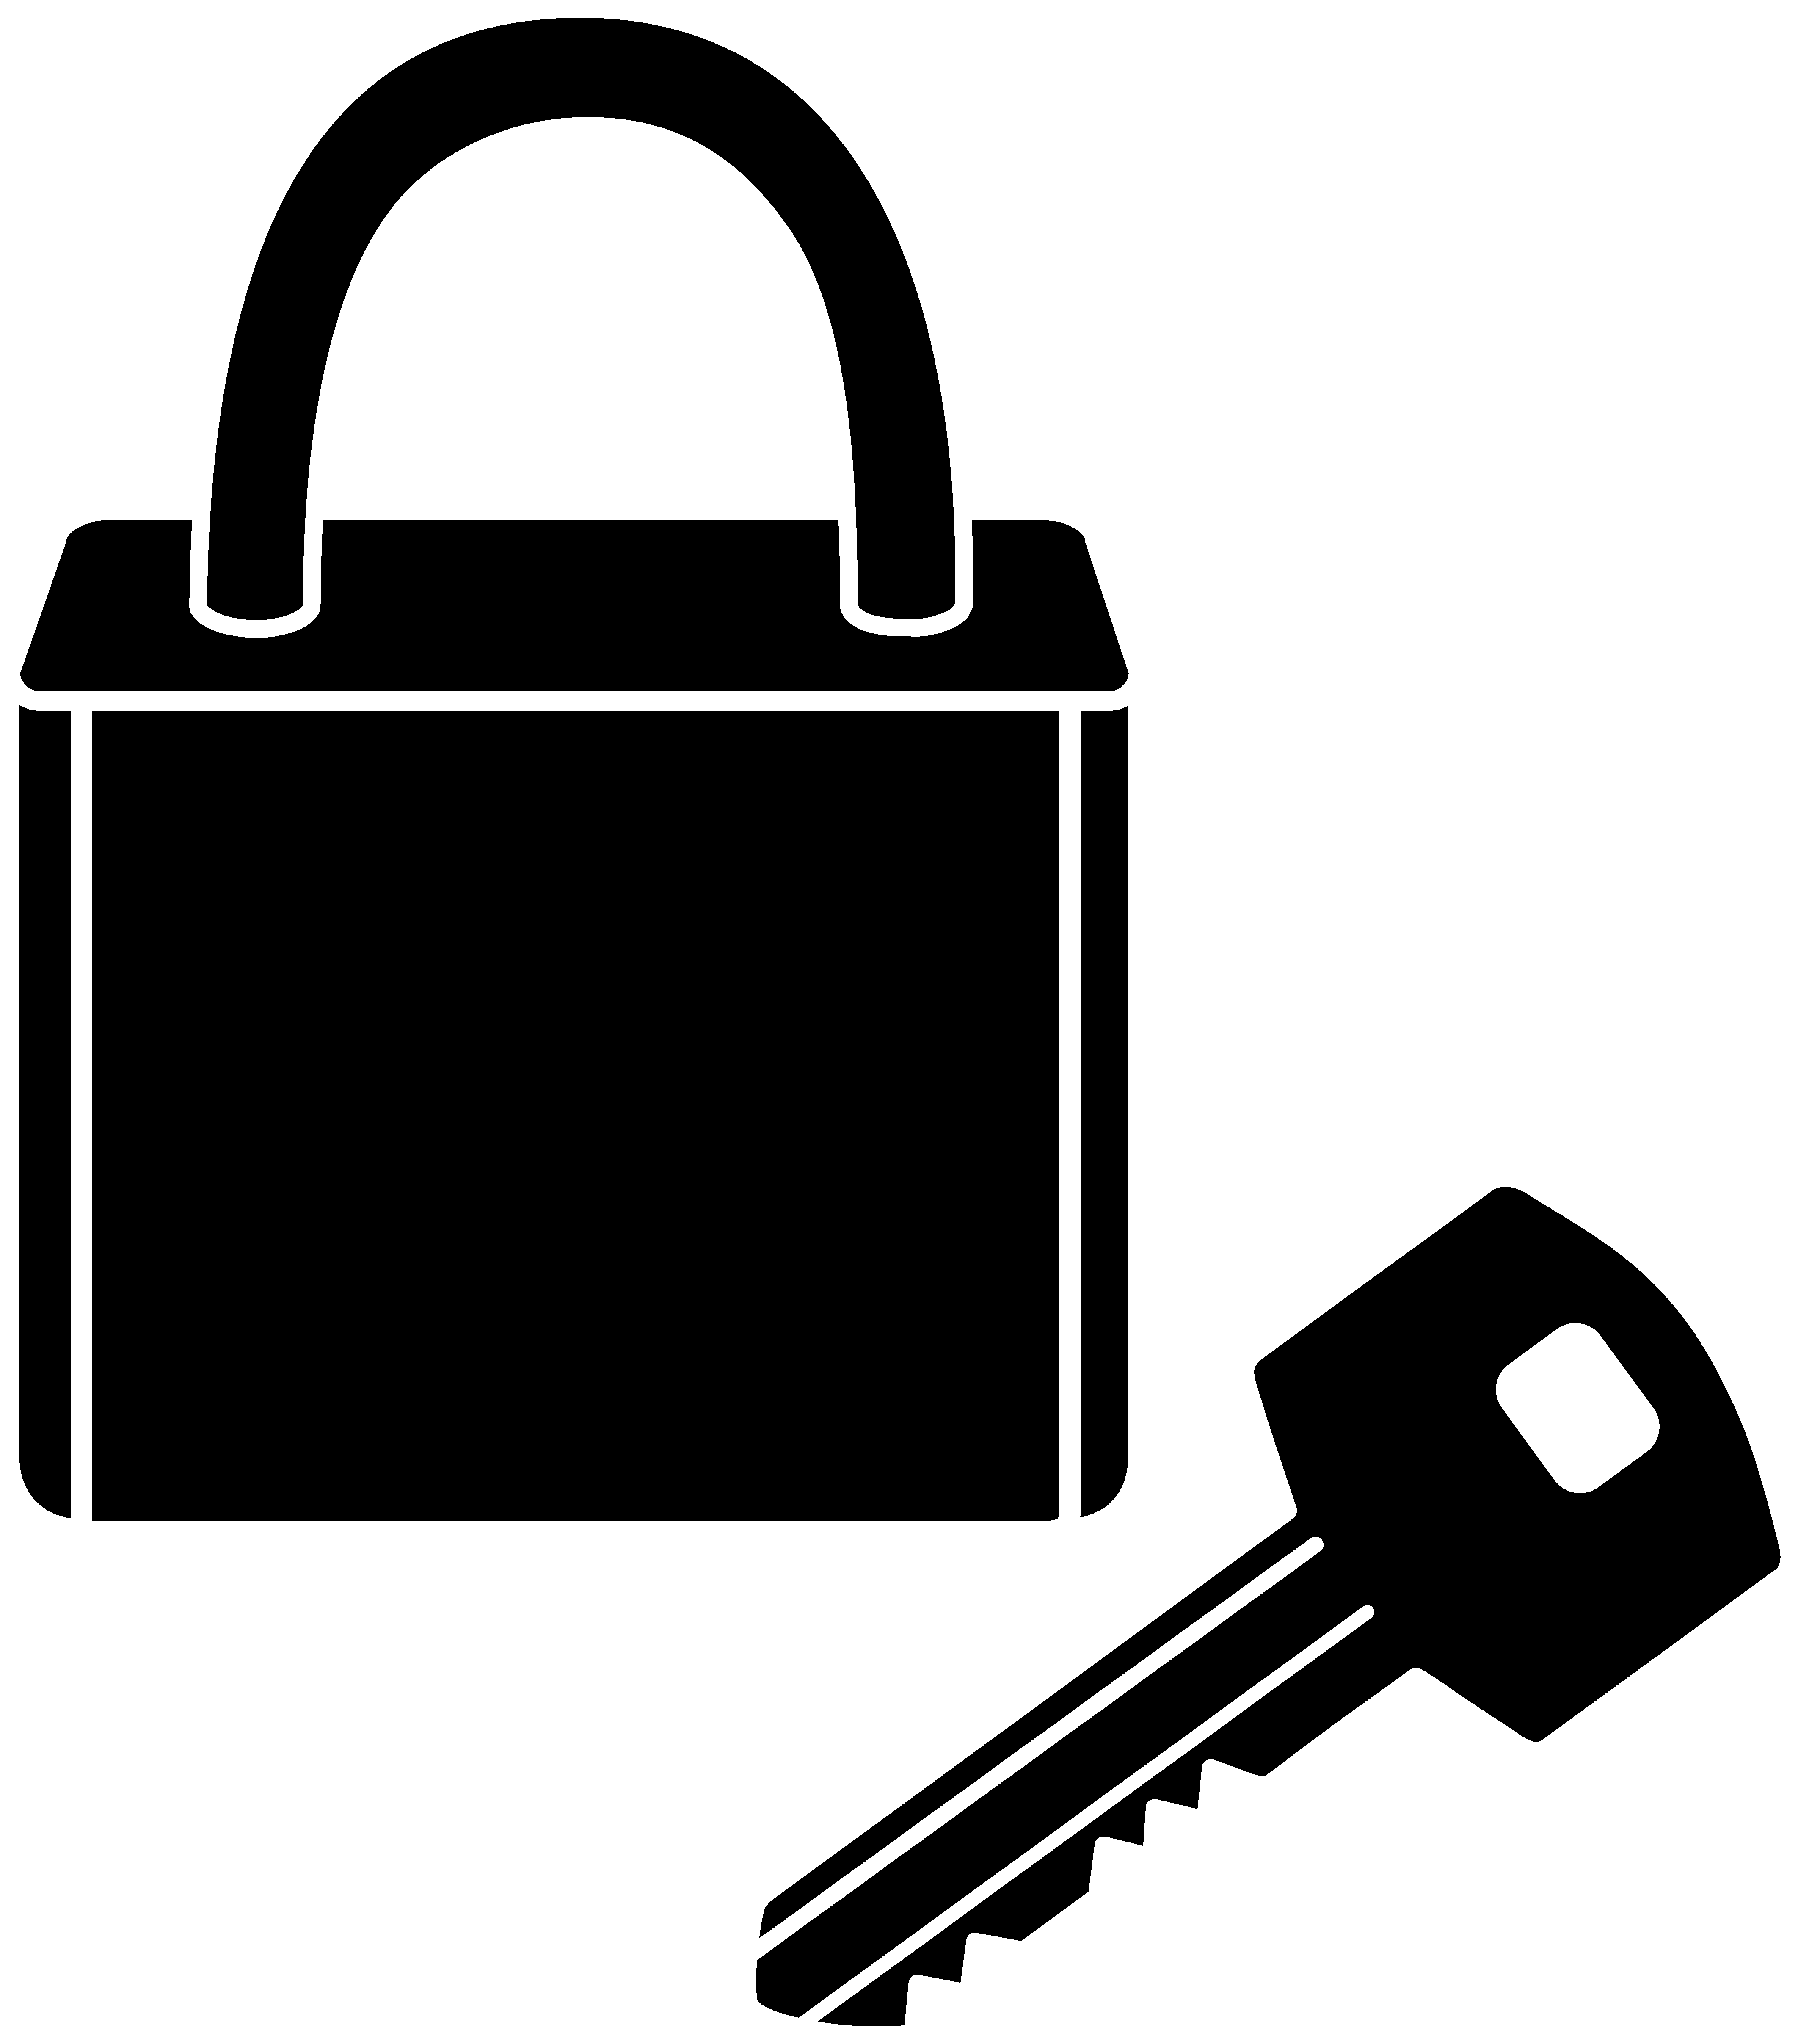 padlock and key clipart - photo #1